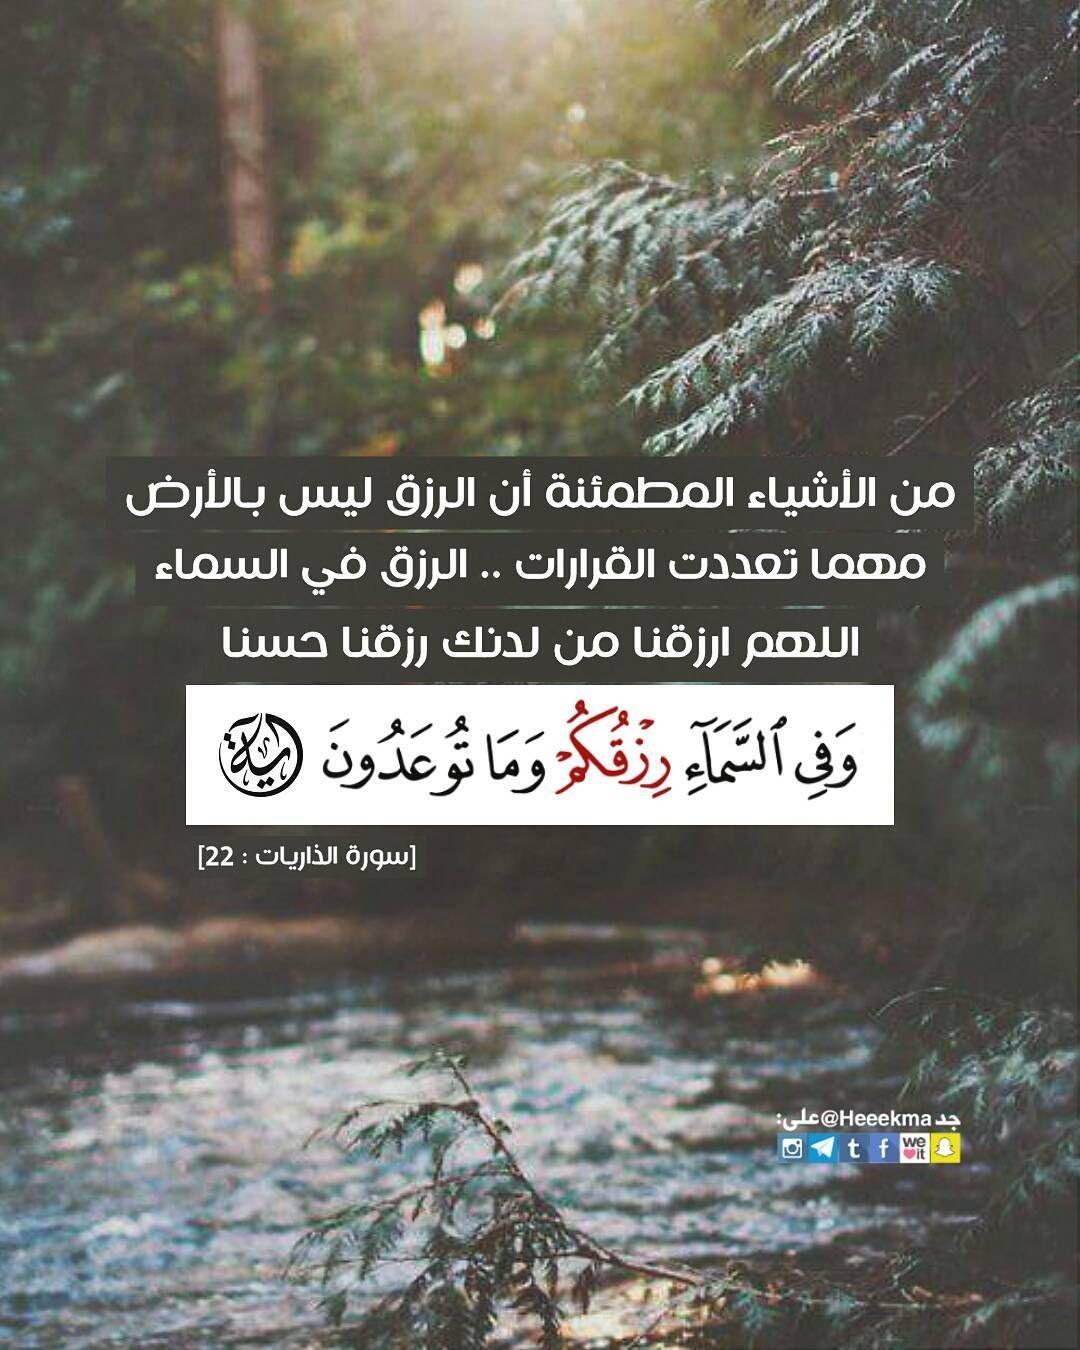 1 382 Likes 25 Comments آية و حكمة في صورة Heeekma On Instagram Quot و ل ت ص ن ع ع ل ى ع Islamic Quotes Quran Quran Verses Quran Quotes Verses